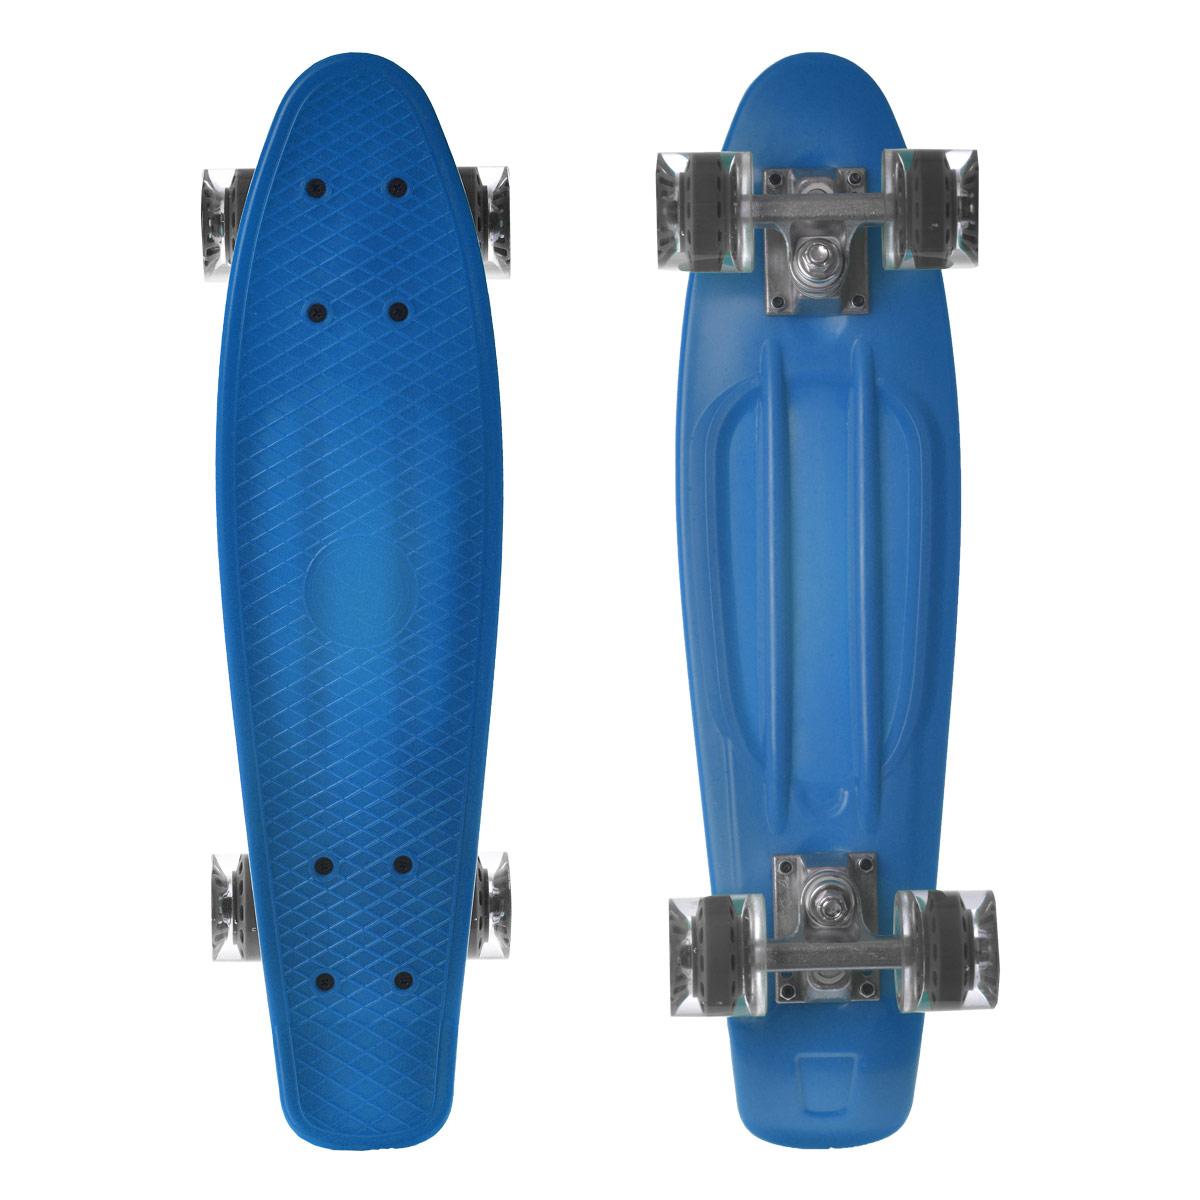 "Пенни борд ""Larsen"", цвет: синий, 55 см х 15 см. BKA0020E"